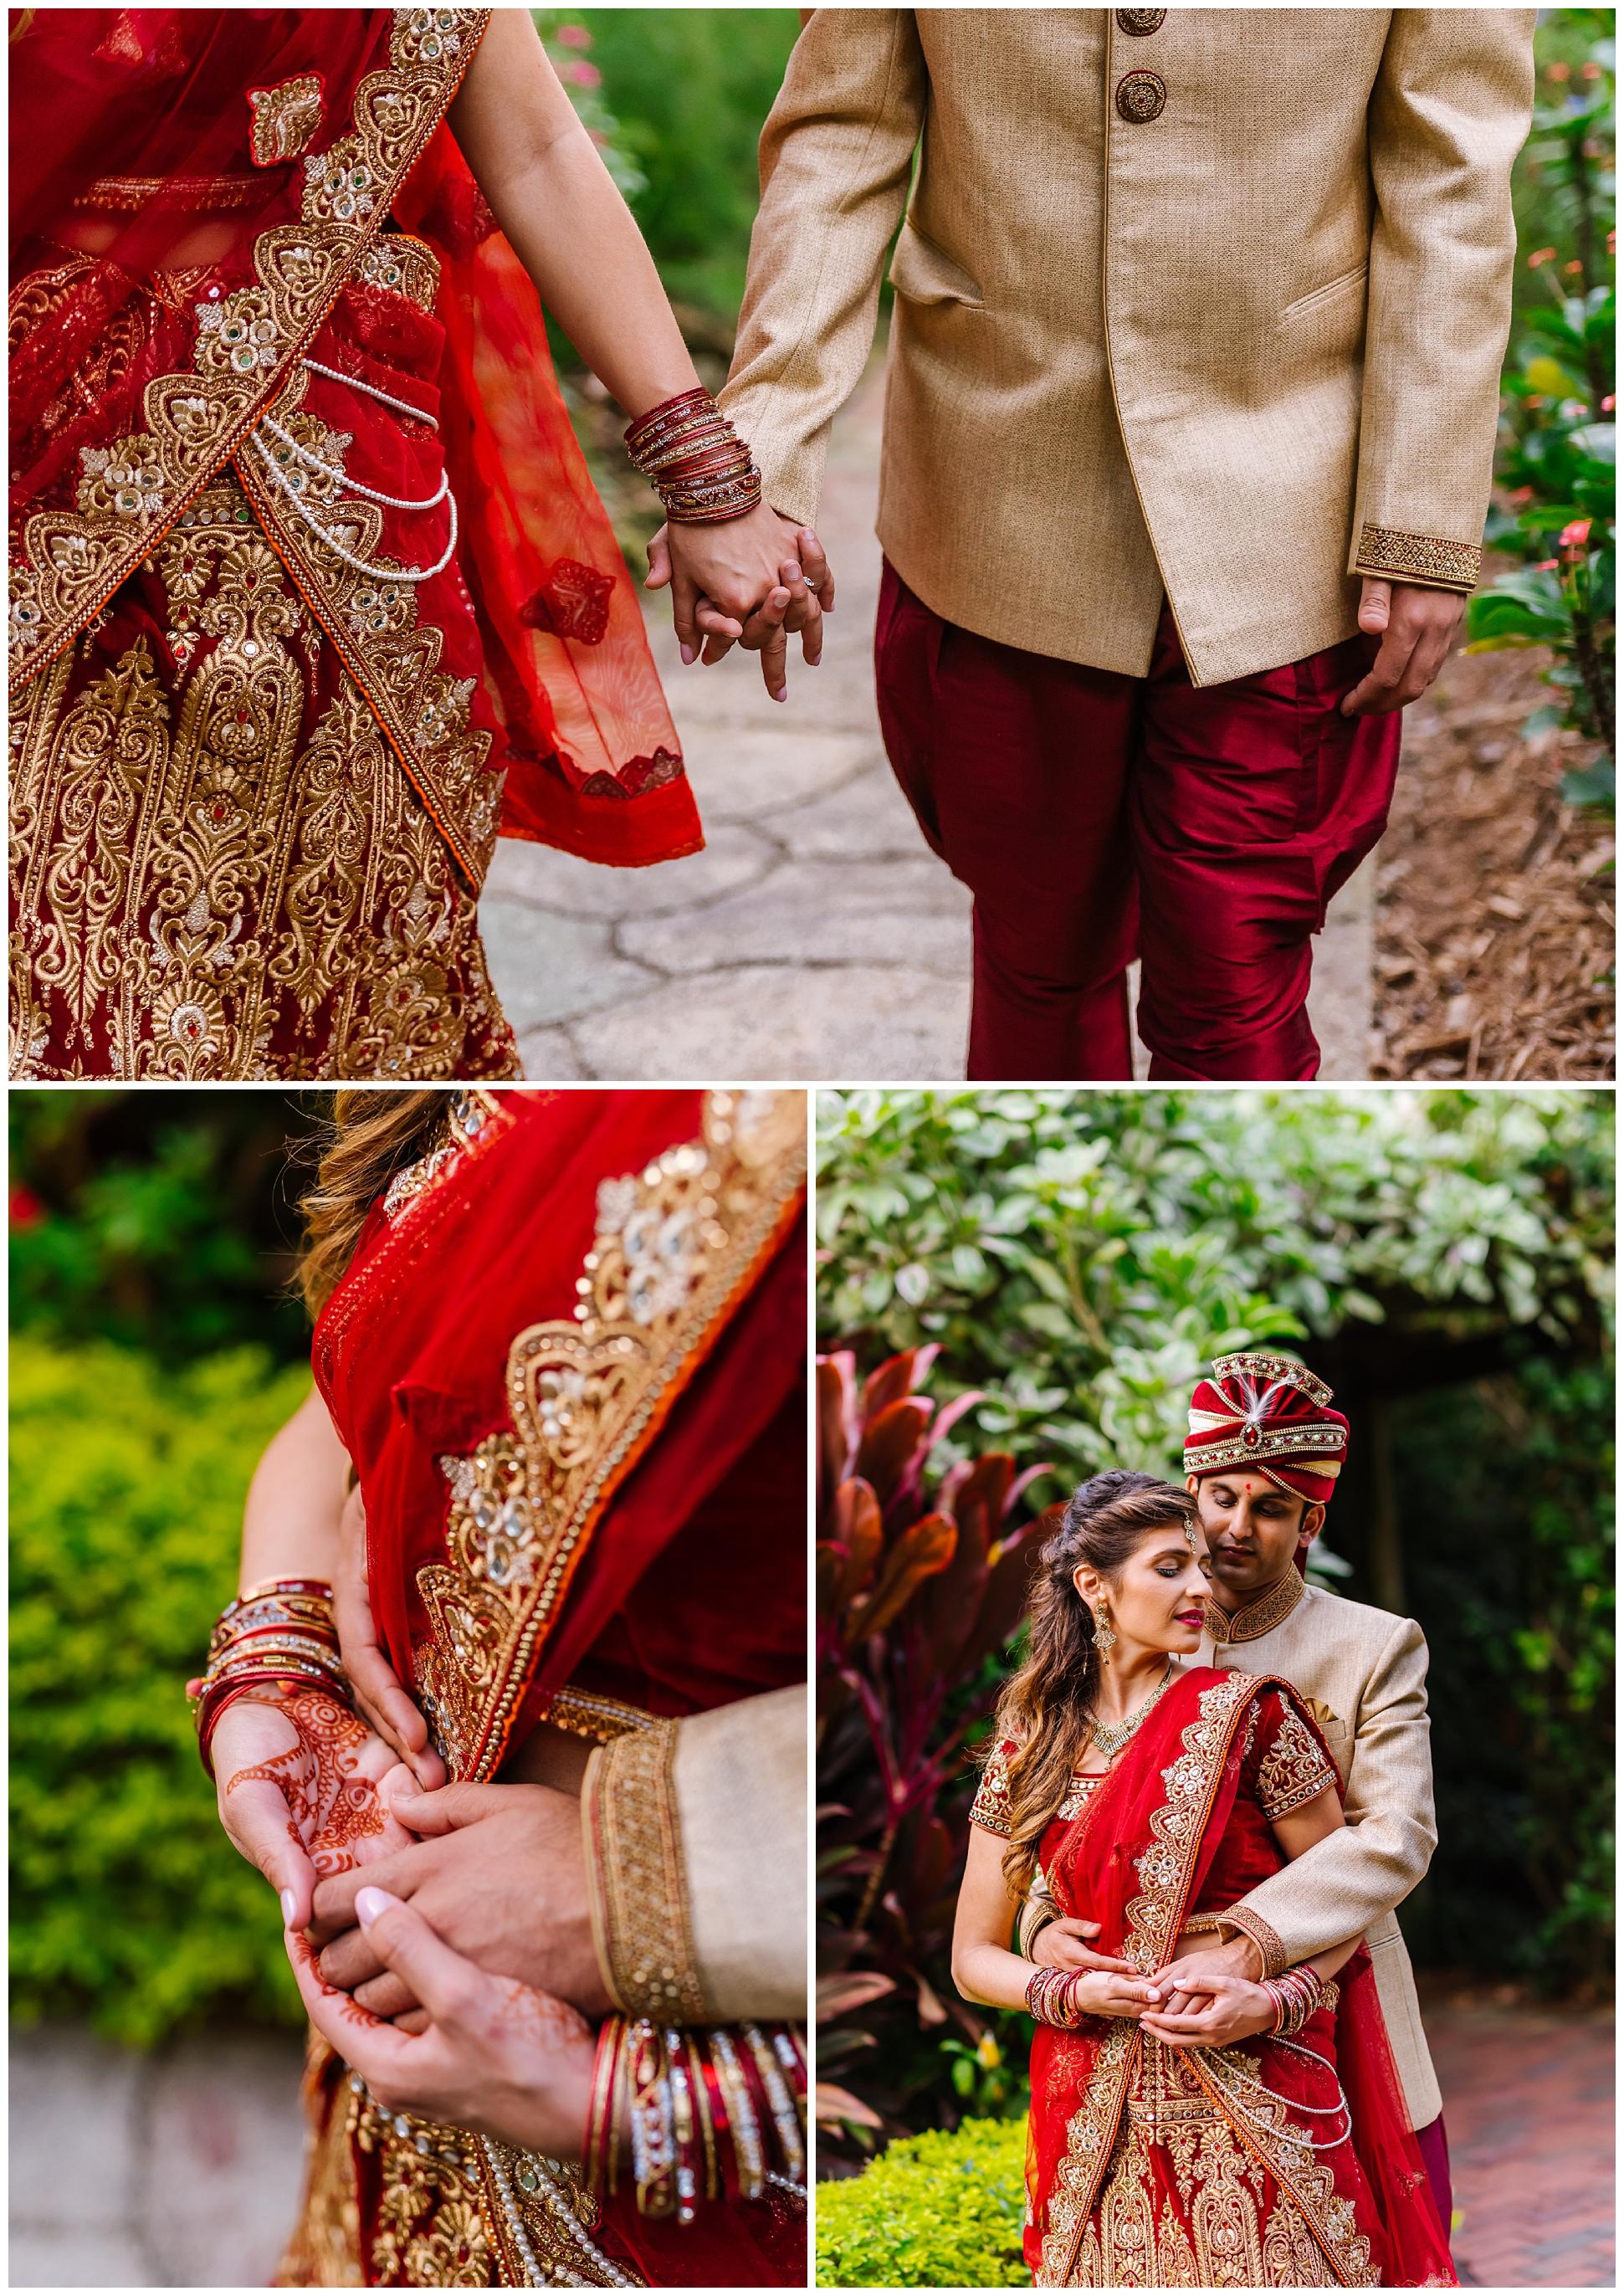 St-pete-indian-wedding-photographer-barat-sunken-gardens_0135.jpg